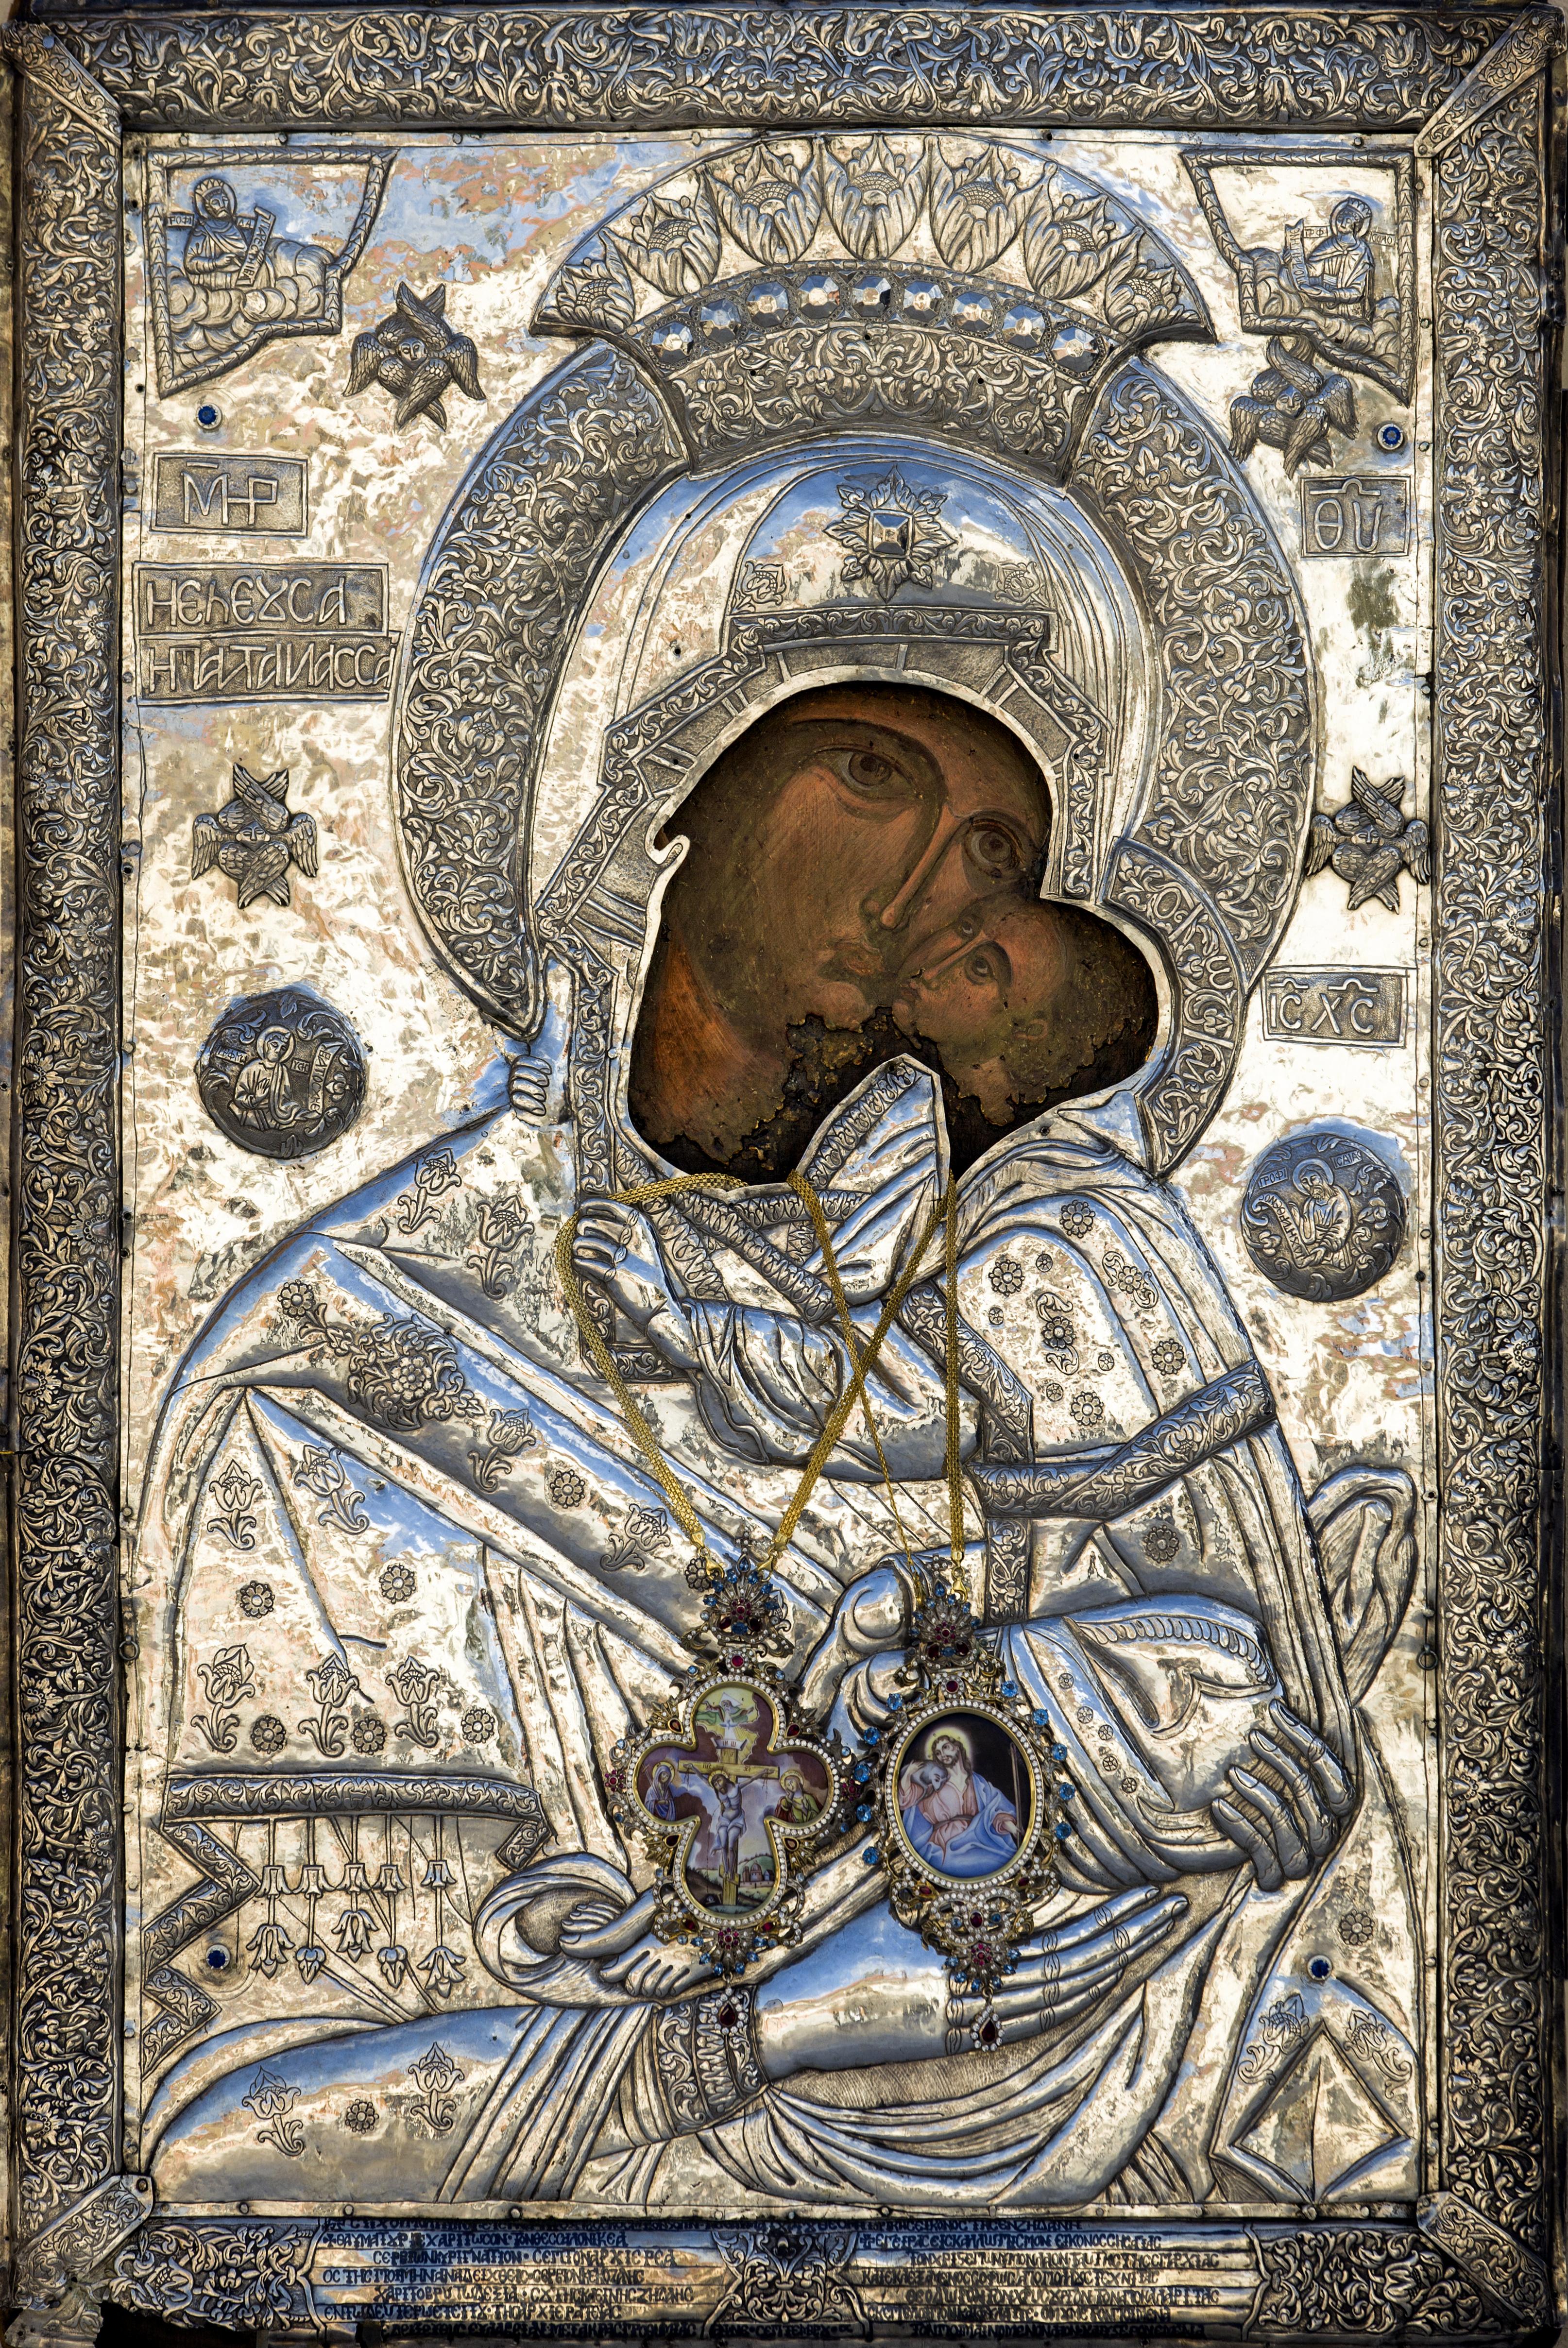 H Iερή Eικόνα της Παναγίας Ζιδανιώτισσας στην Κοζάνη